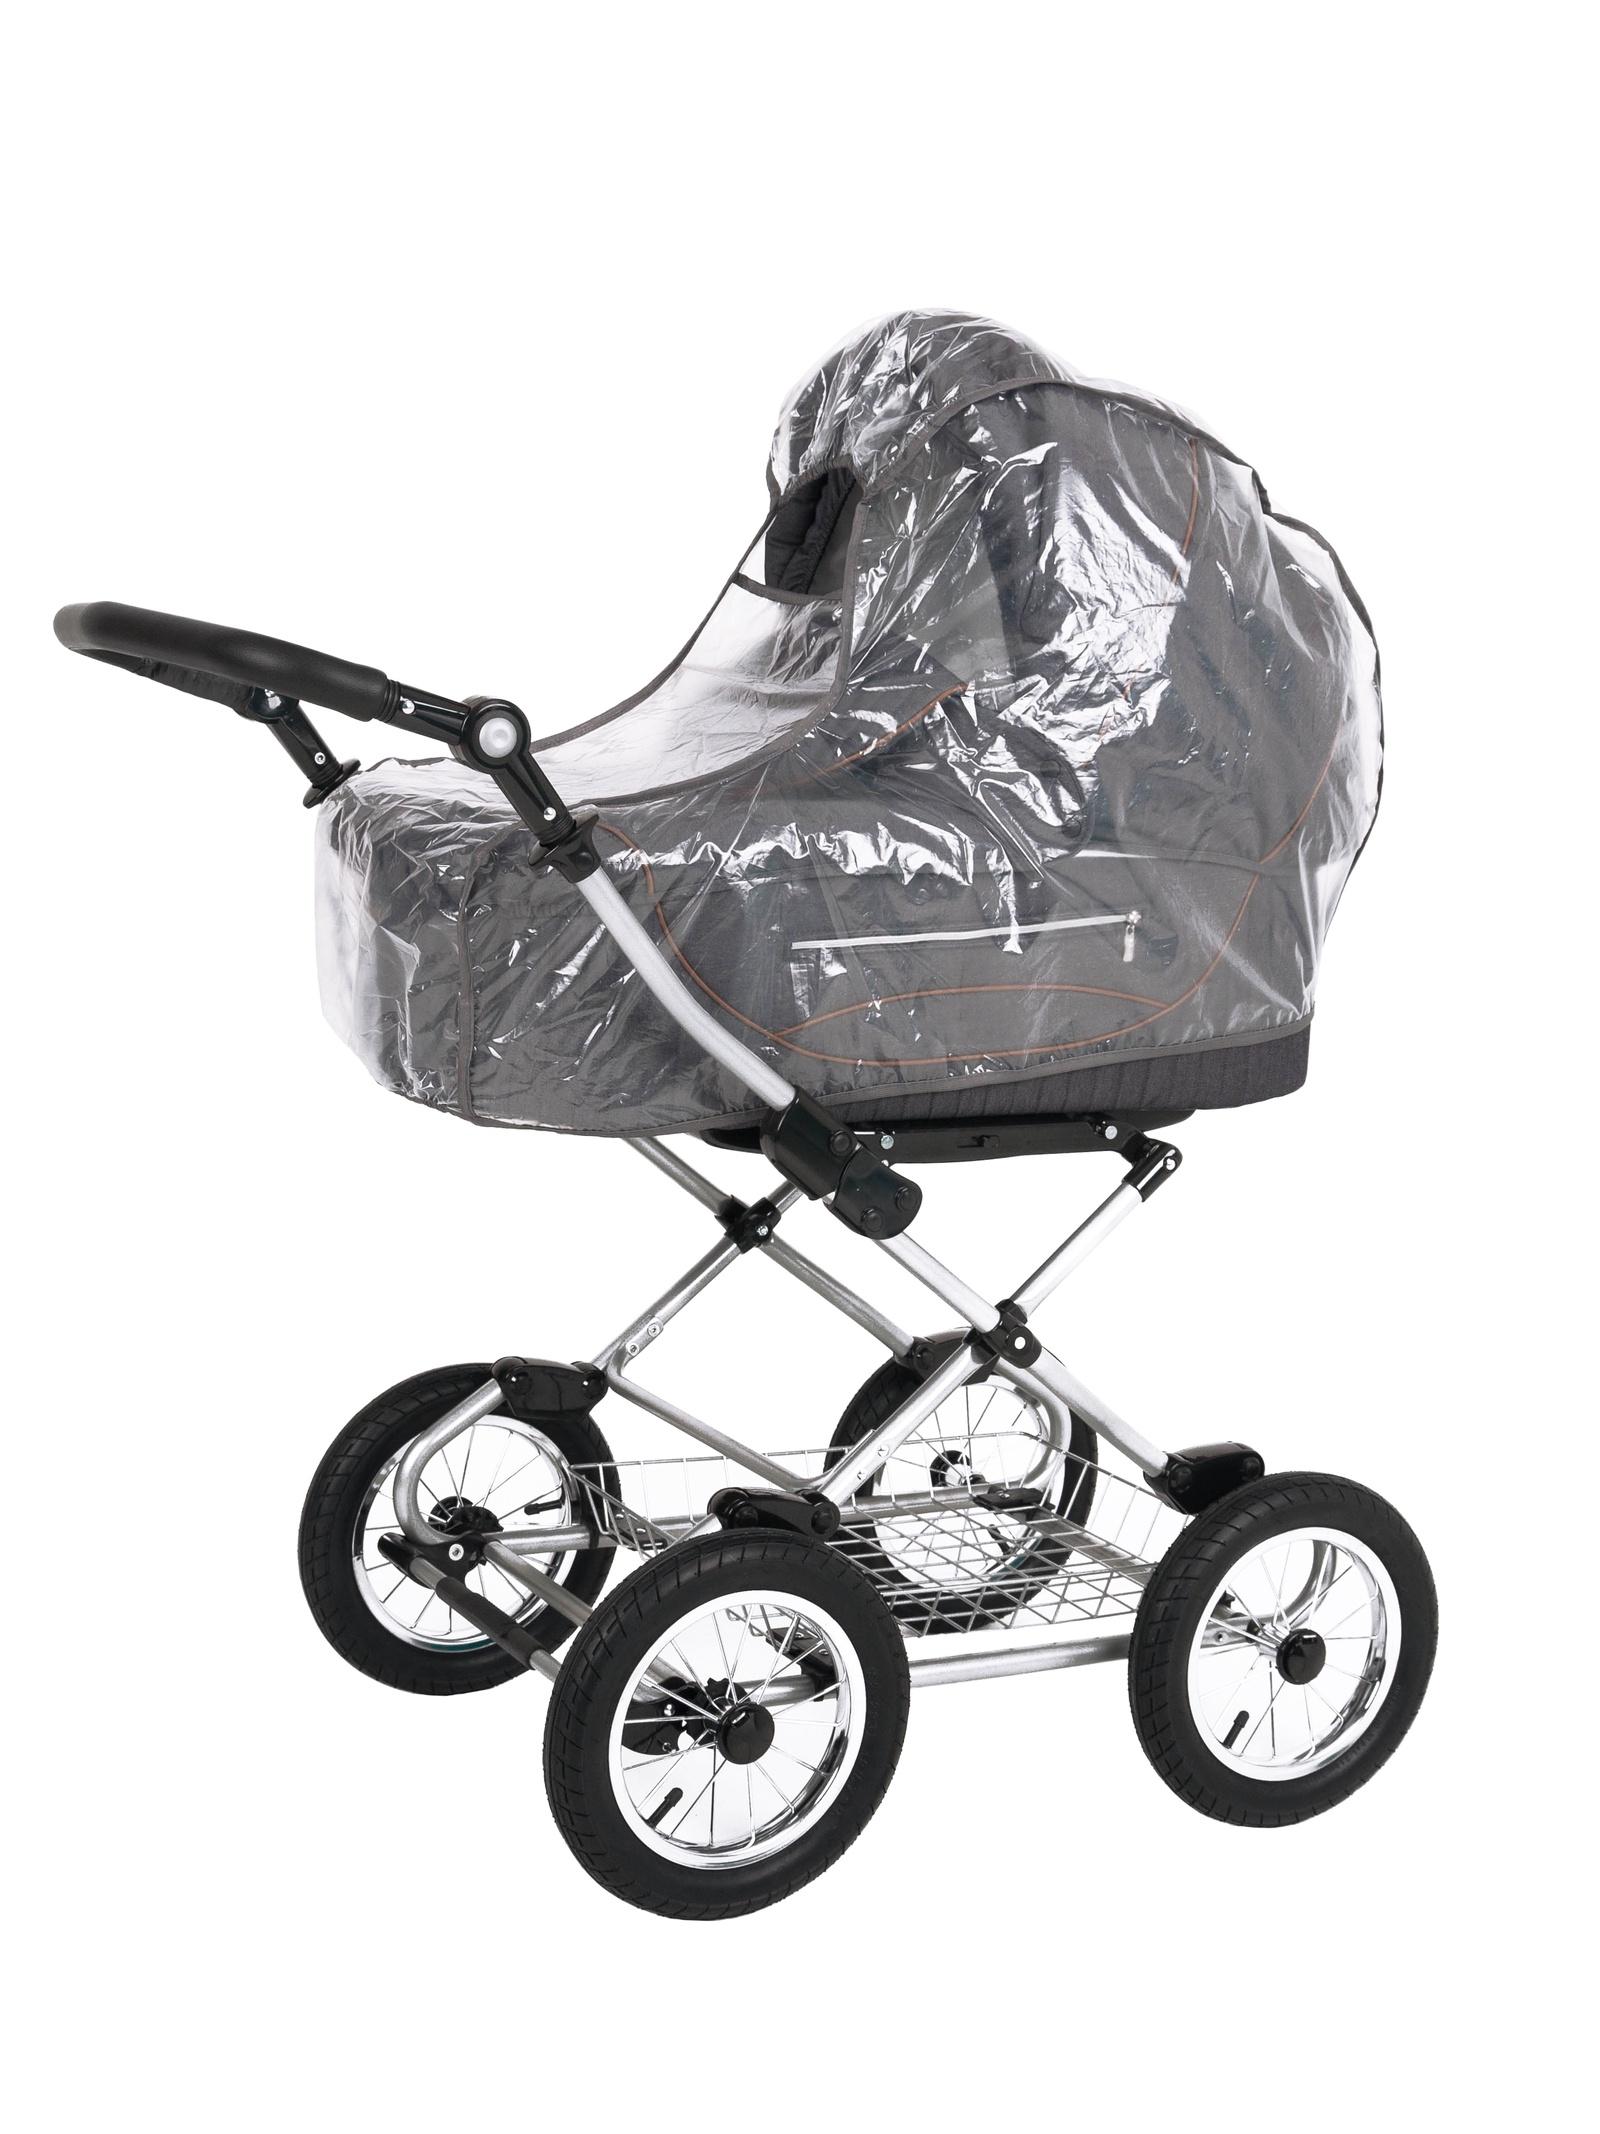 Аксессуар для колясок Trottola Дождевик на коляску люльку CLASSIC прозрачный сетка полог help 140x90 см на детскую коляску или люльку 1066664